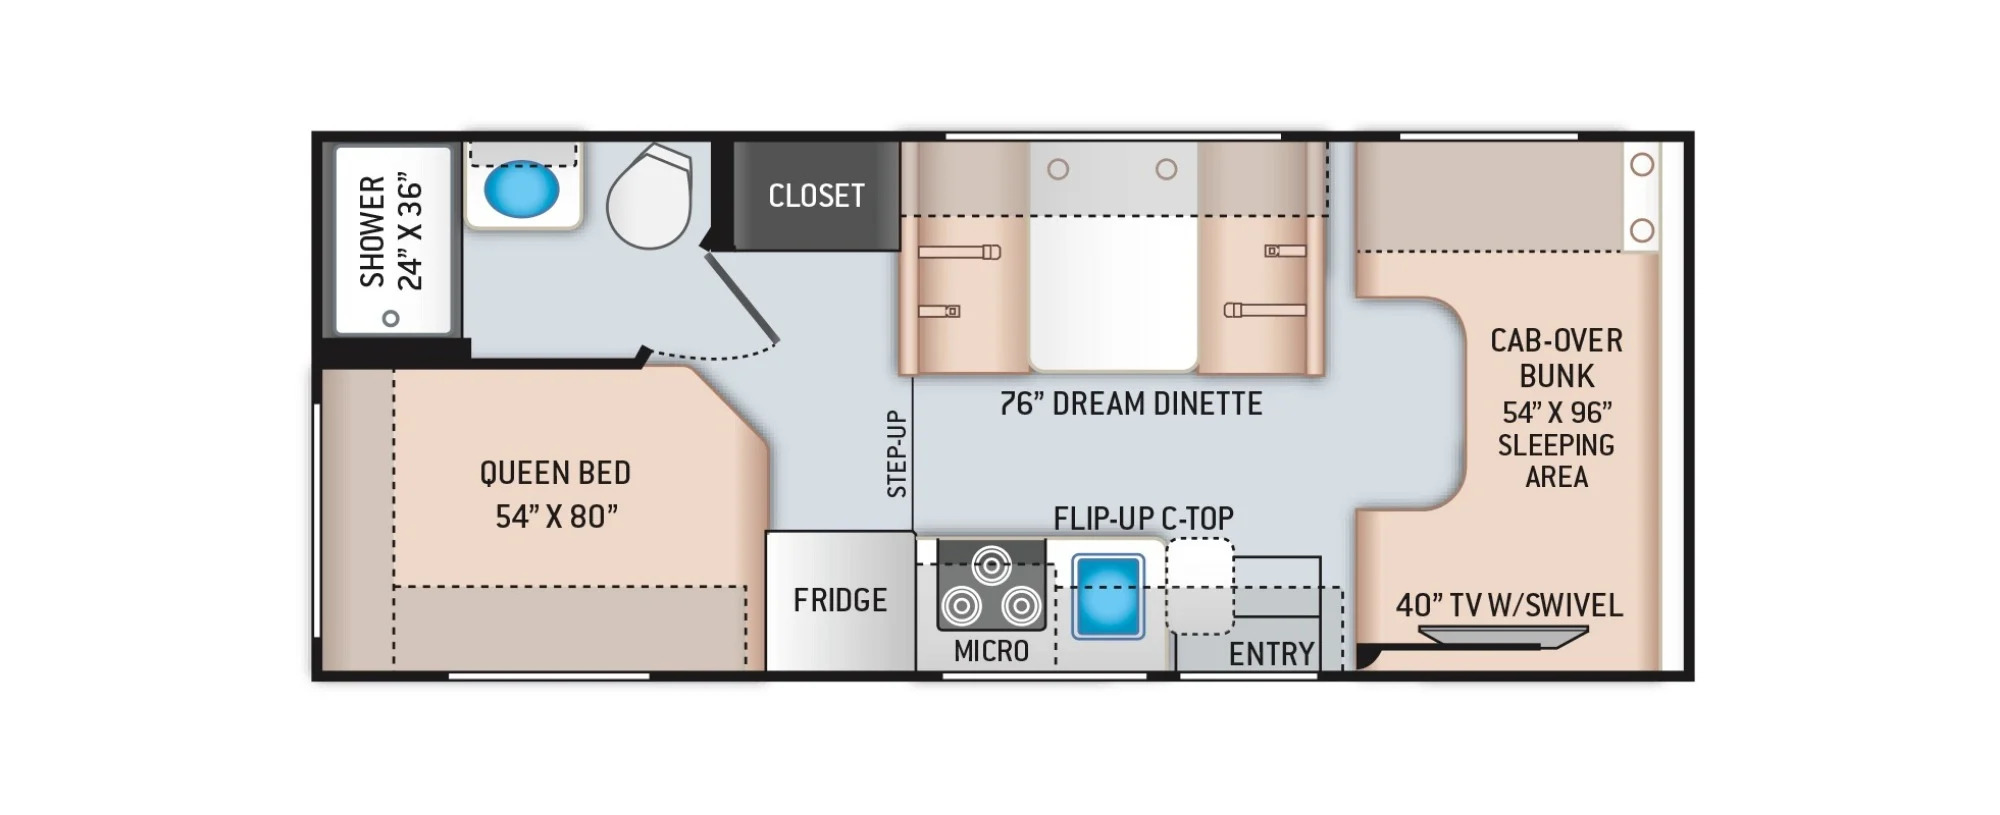 View Floor Plan for 2022 THOR FREEDOM ELITE 22HEC